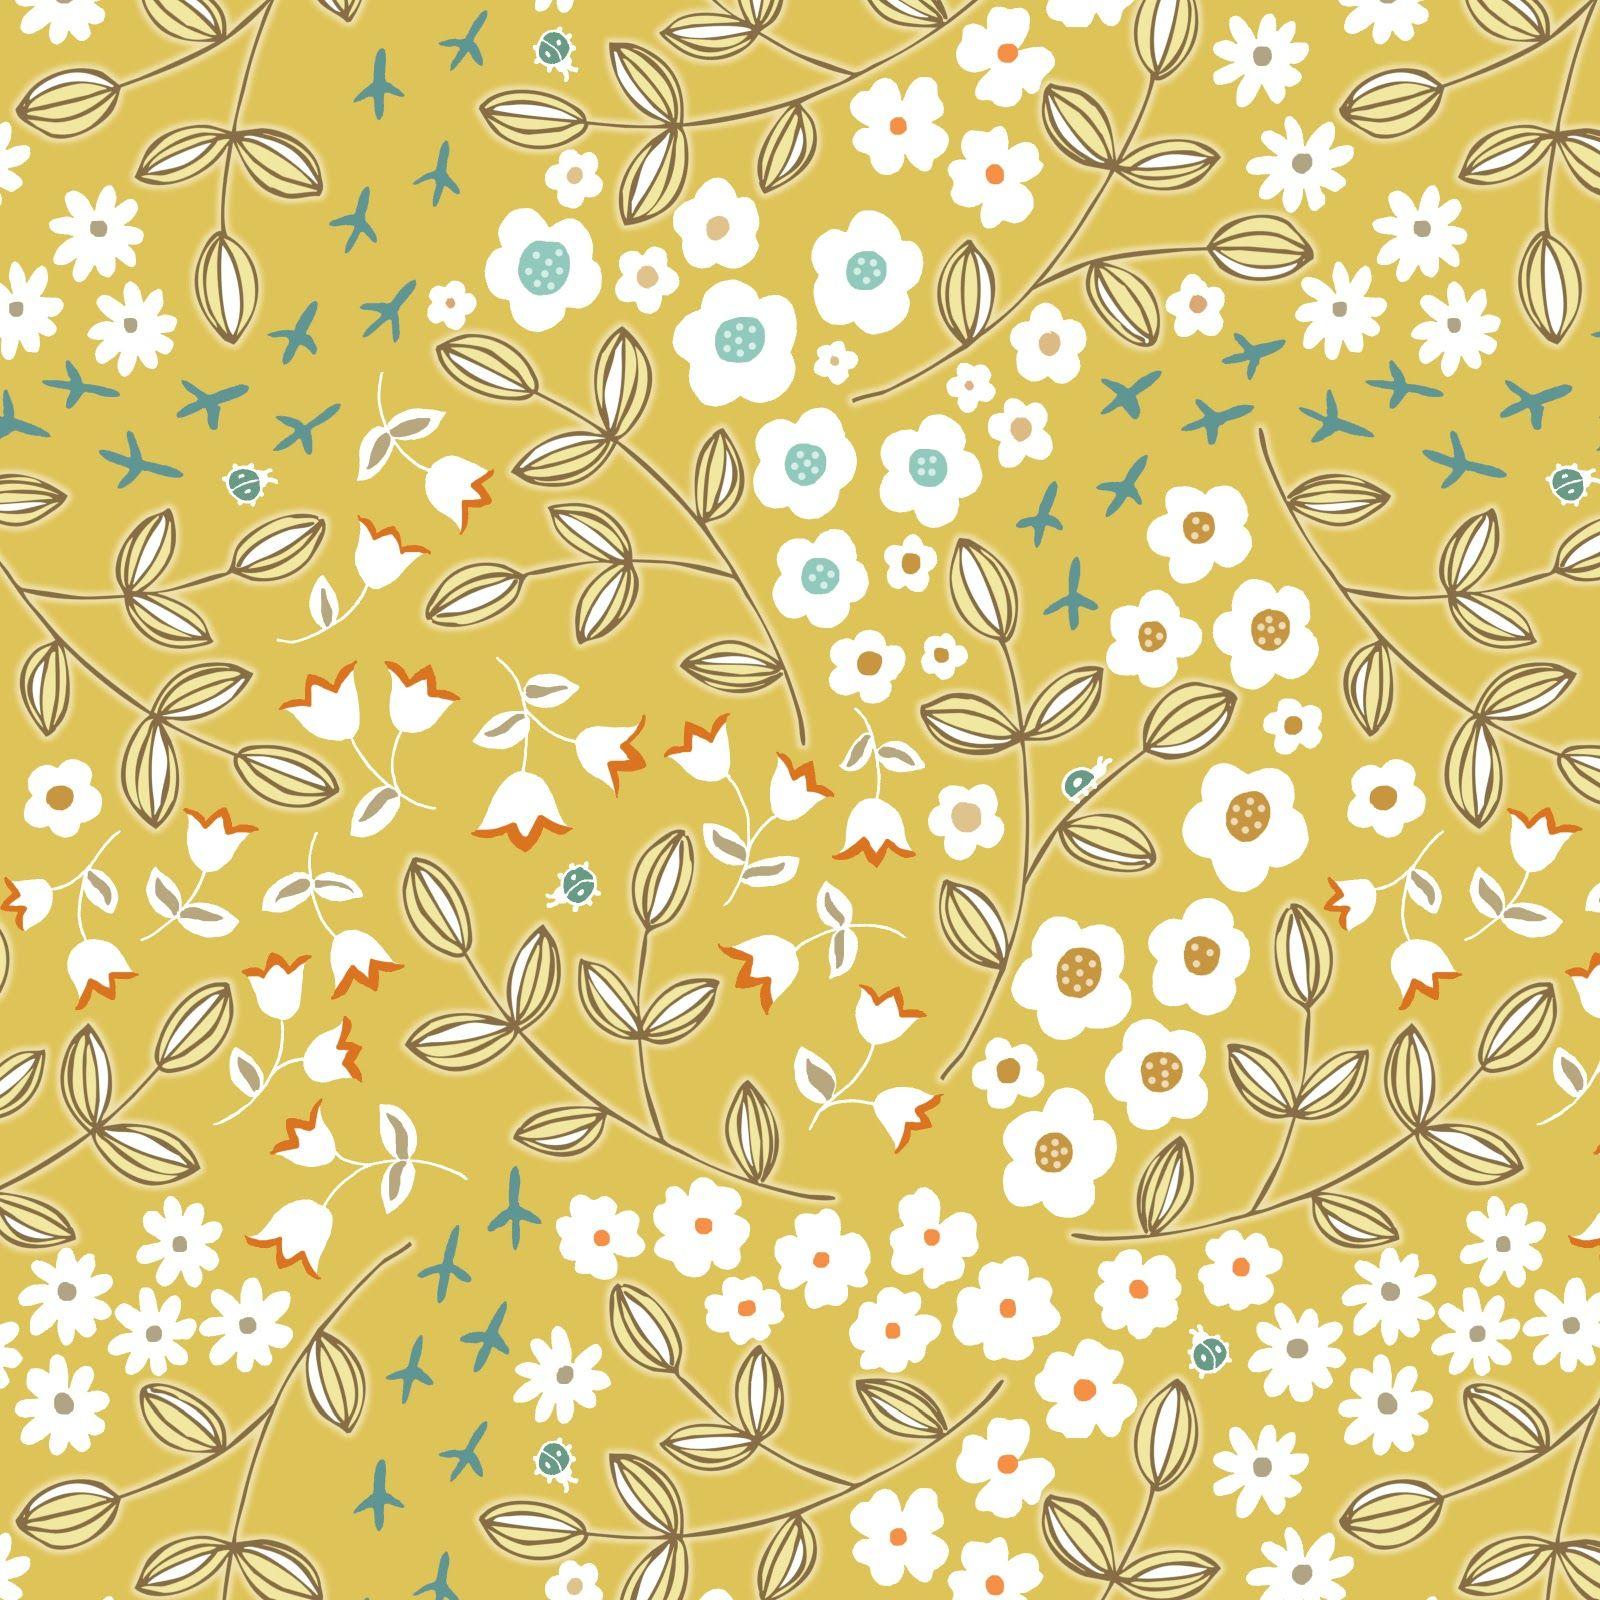 2015 Ditsy Floral Design: Beckandlundy: Surface Design - Ditsy Prints